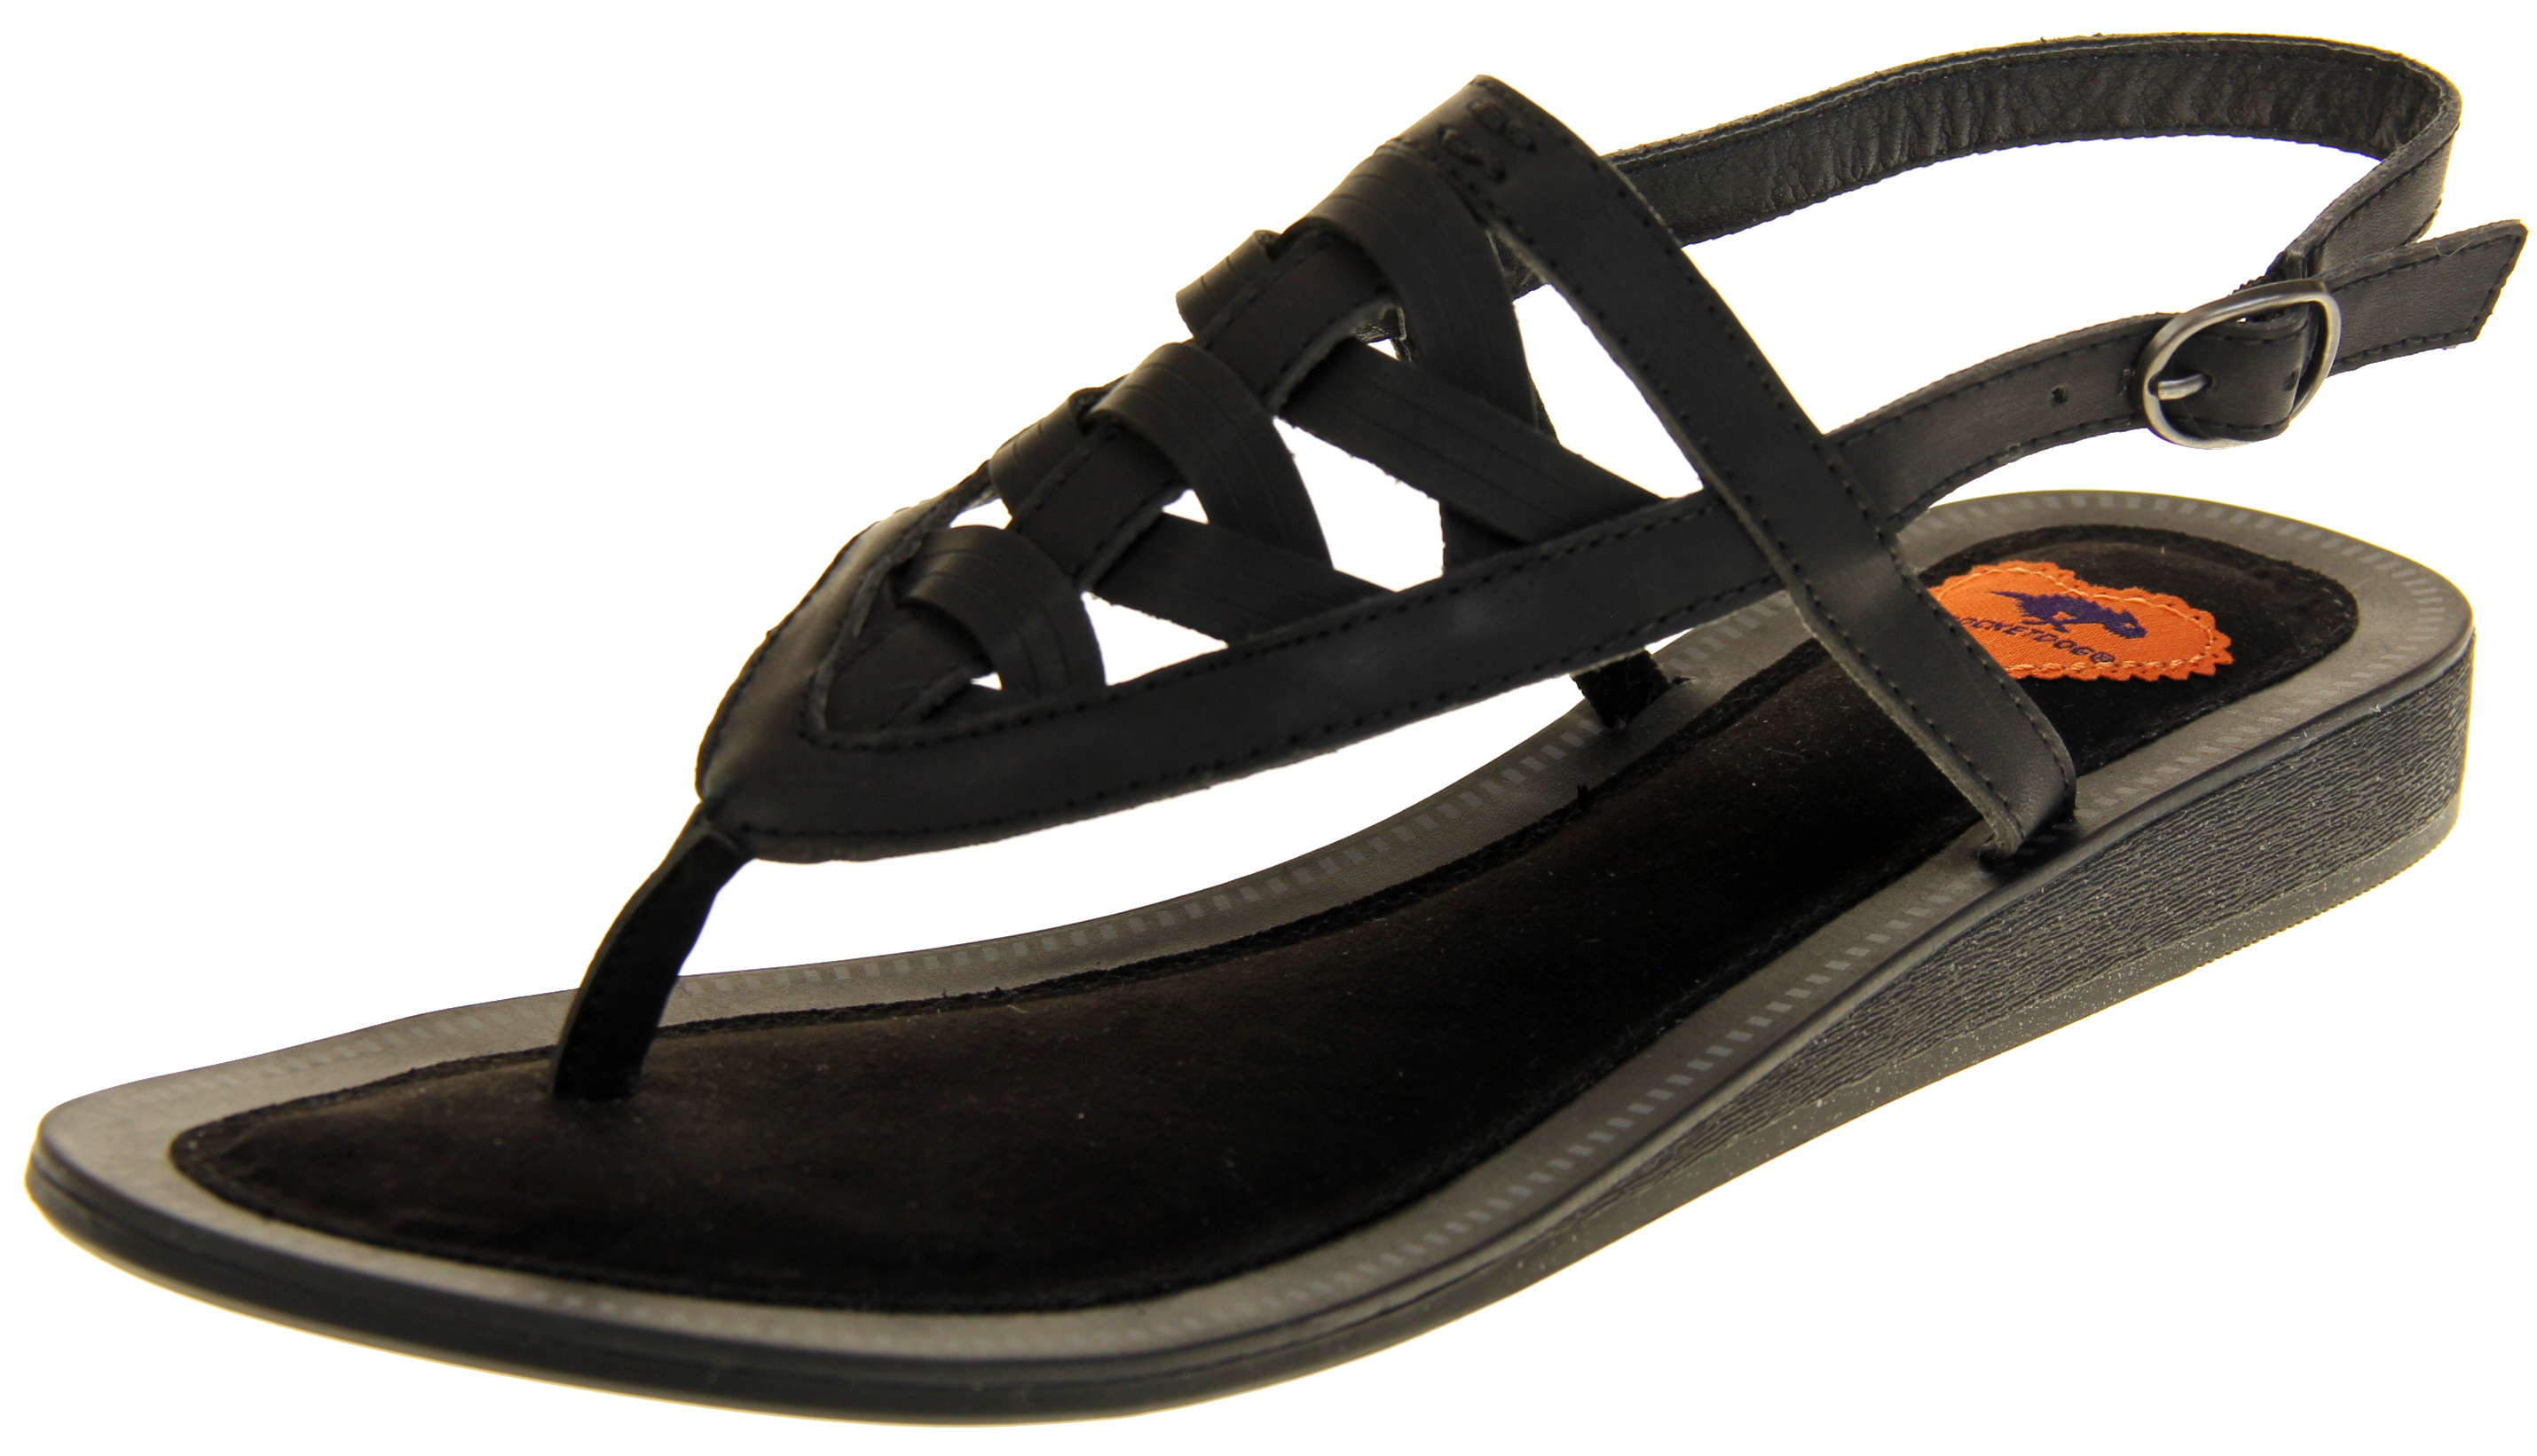 475da032e Womens Ladies Black Rocket Dog Fashion Sandals Flip Flops